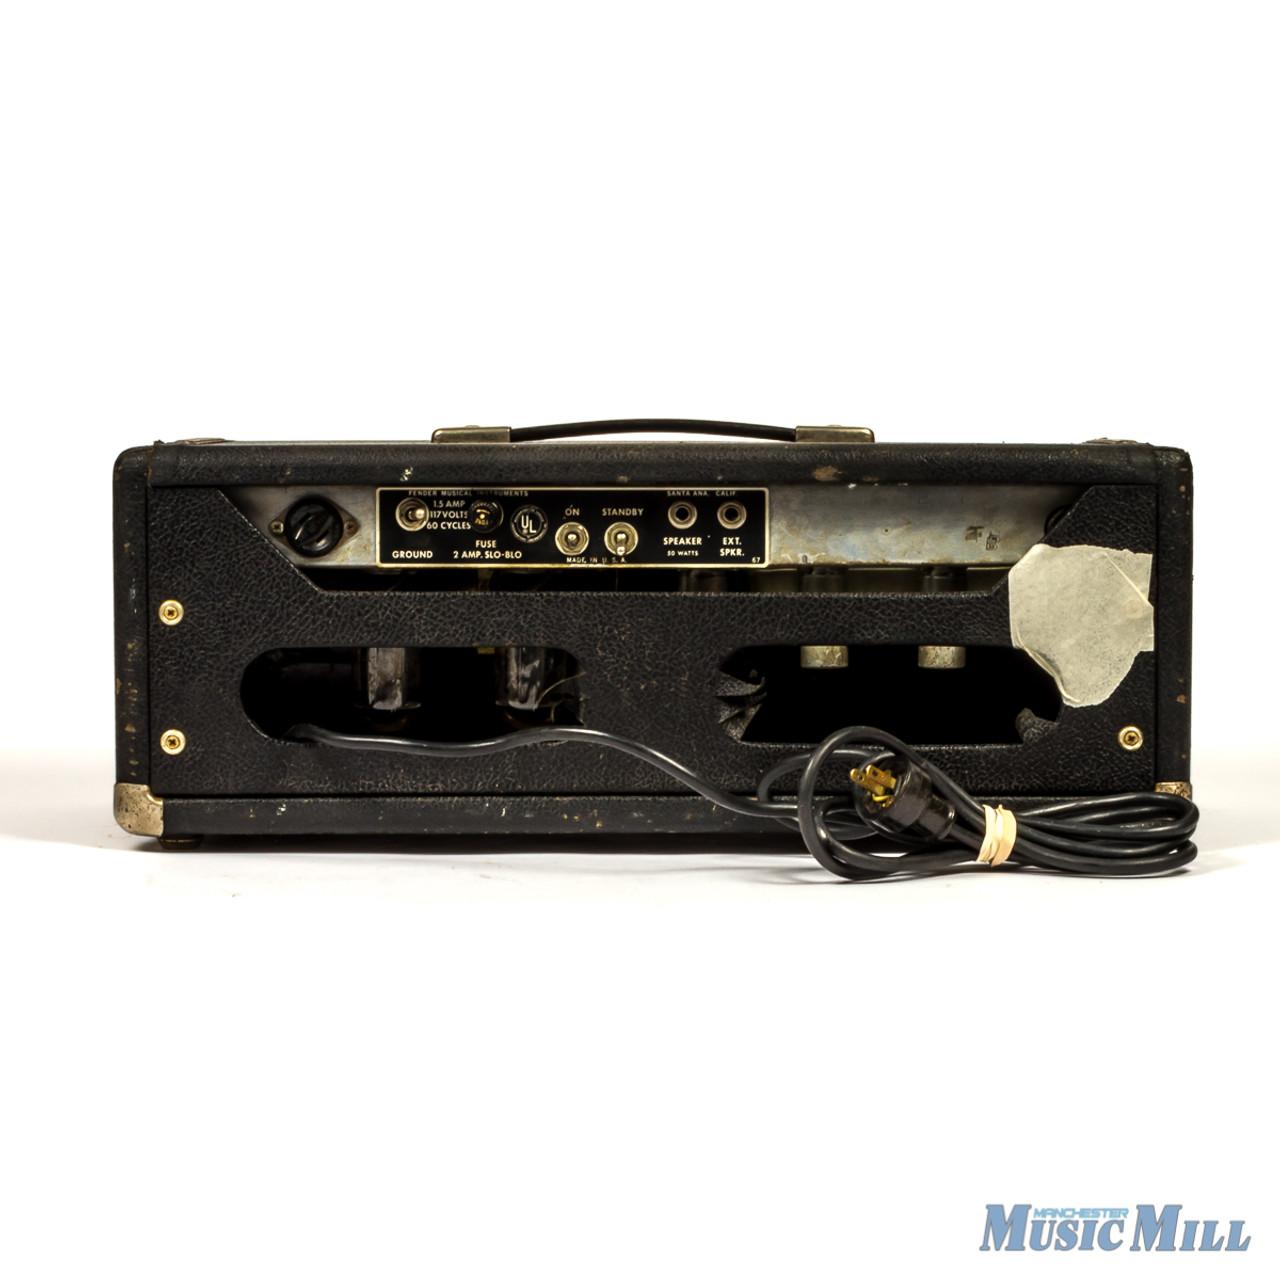 1968 Vintage Fender Bassman Silverface Amplifier Head (USED)